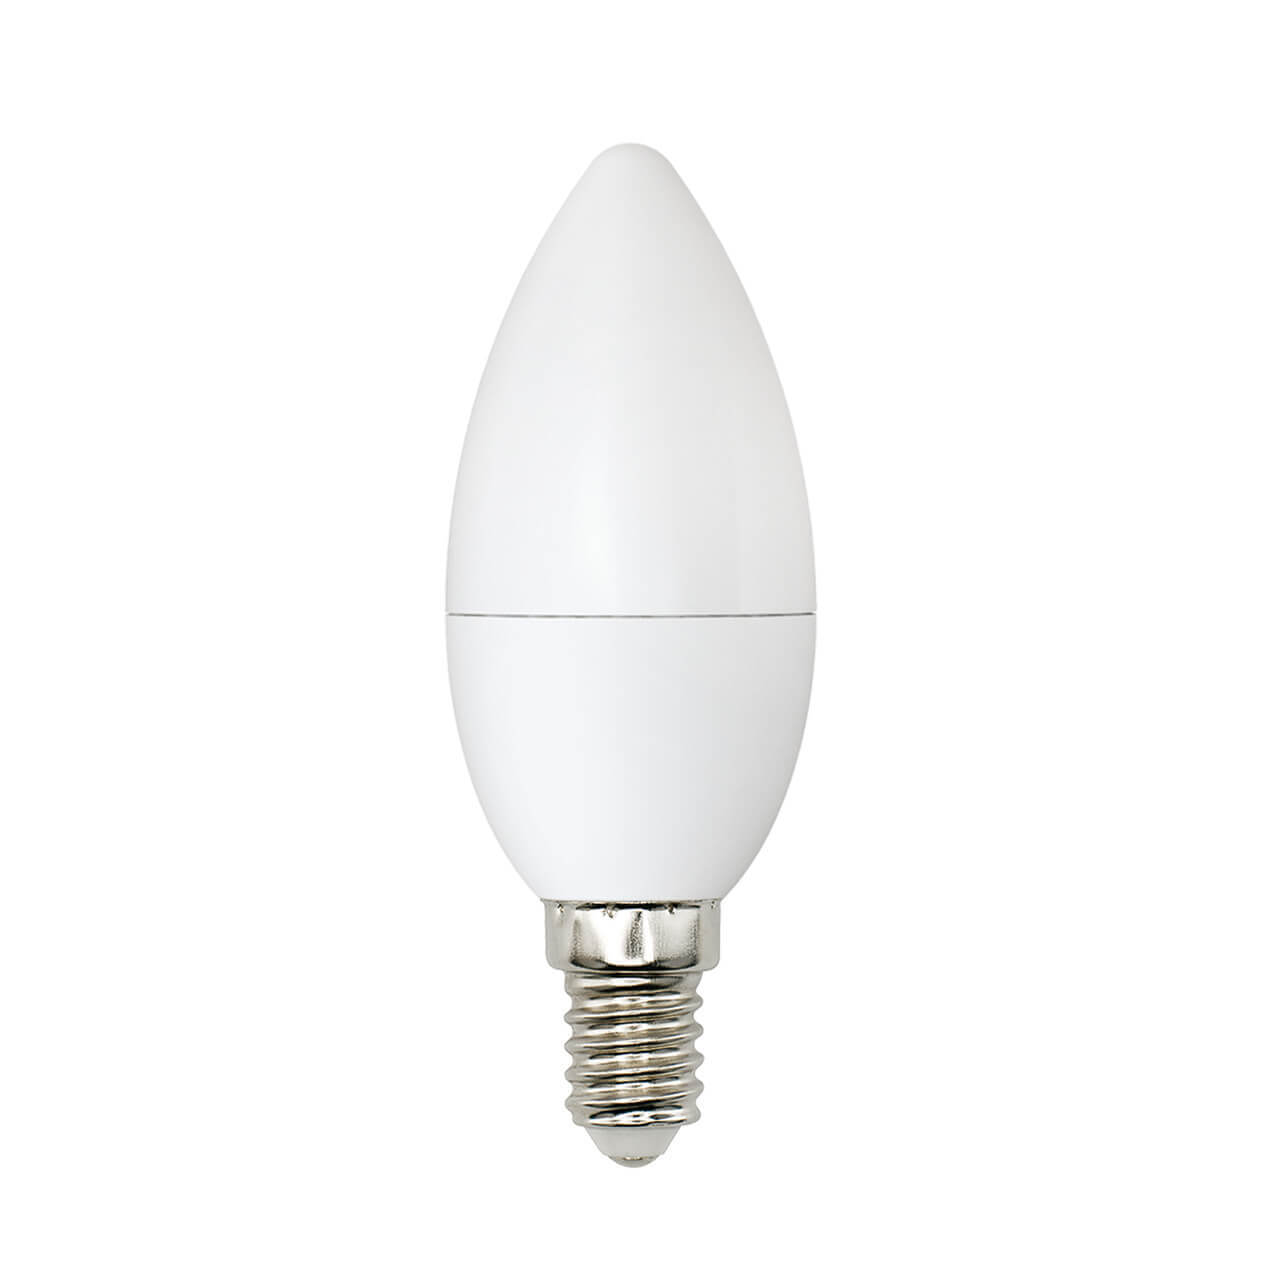 цена на Лампа светодиодная (UL-00001570) Uniel E14 6W 4000K матовая LED-C37-6W/WW+NW/E14/FR PLB01WH